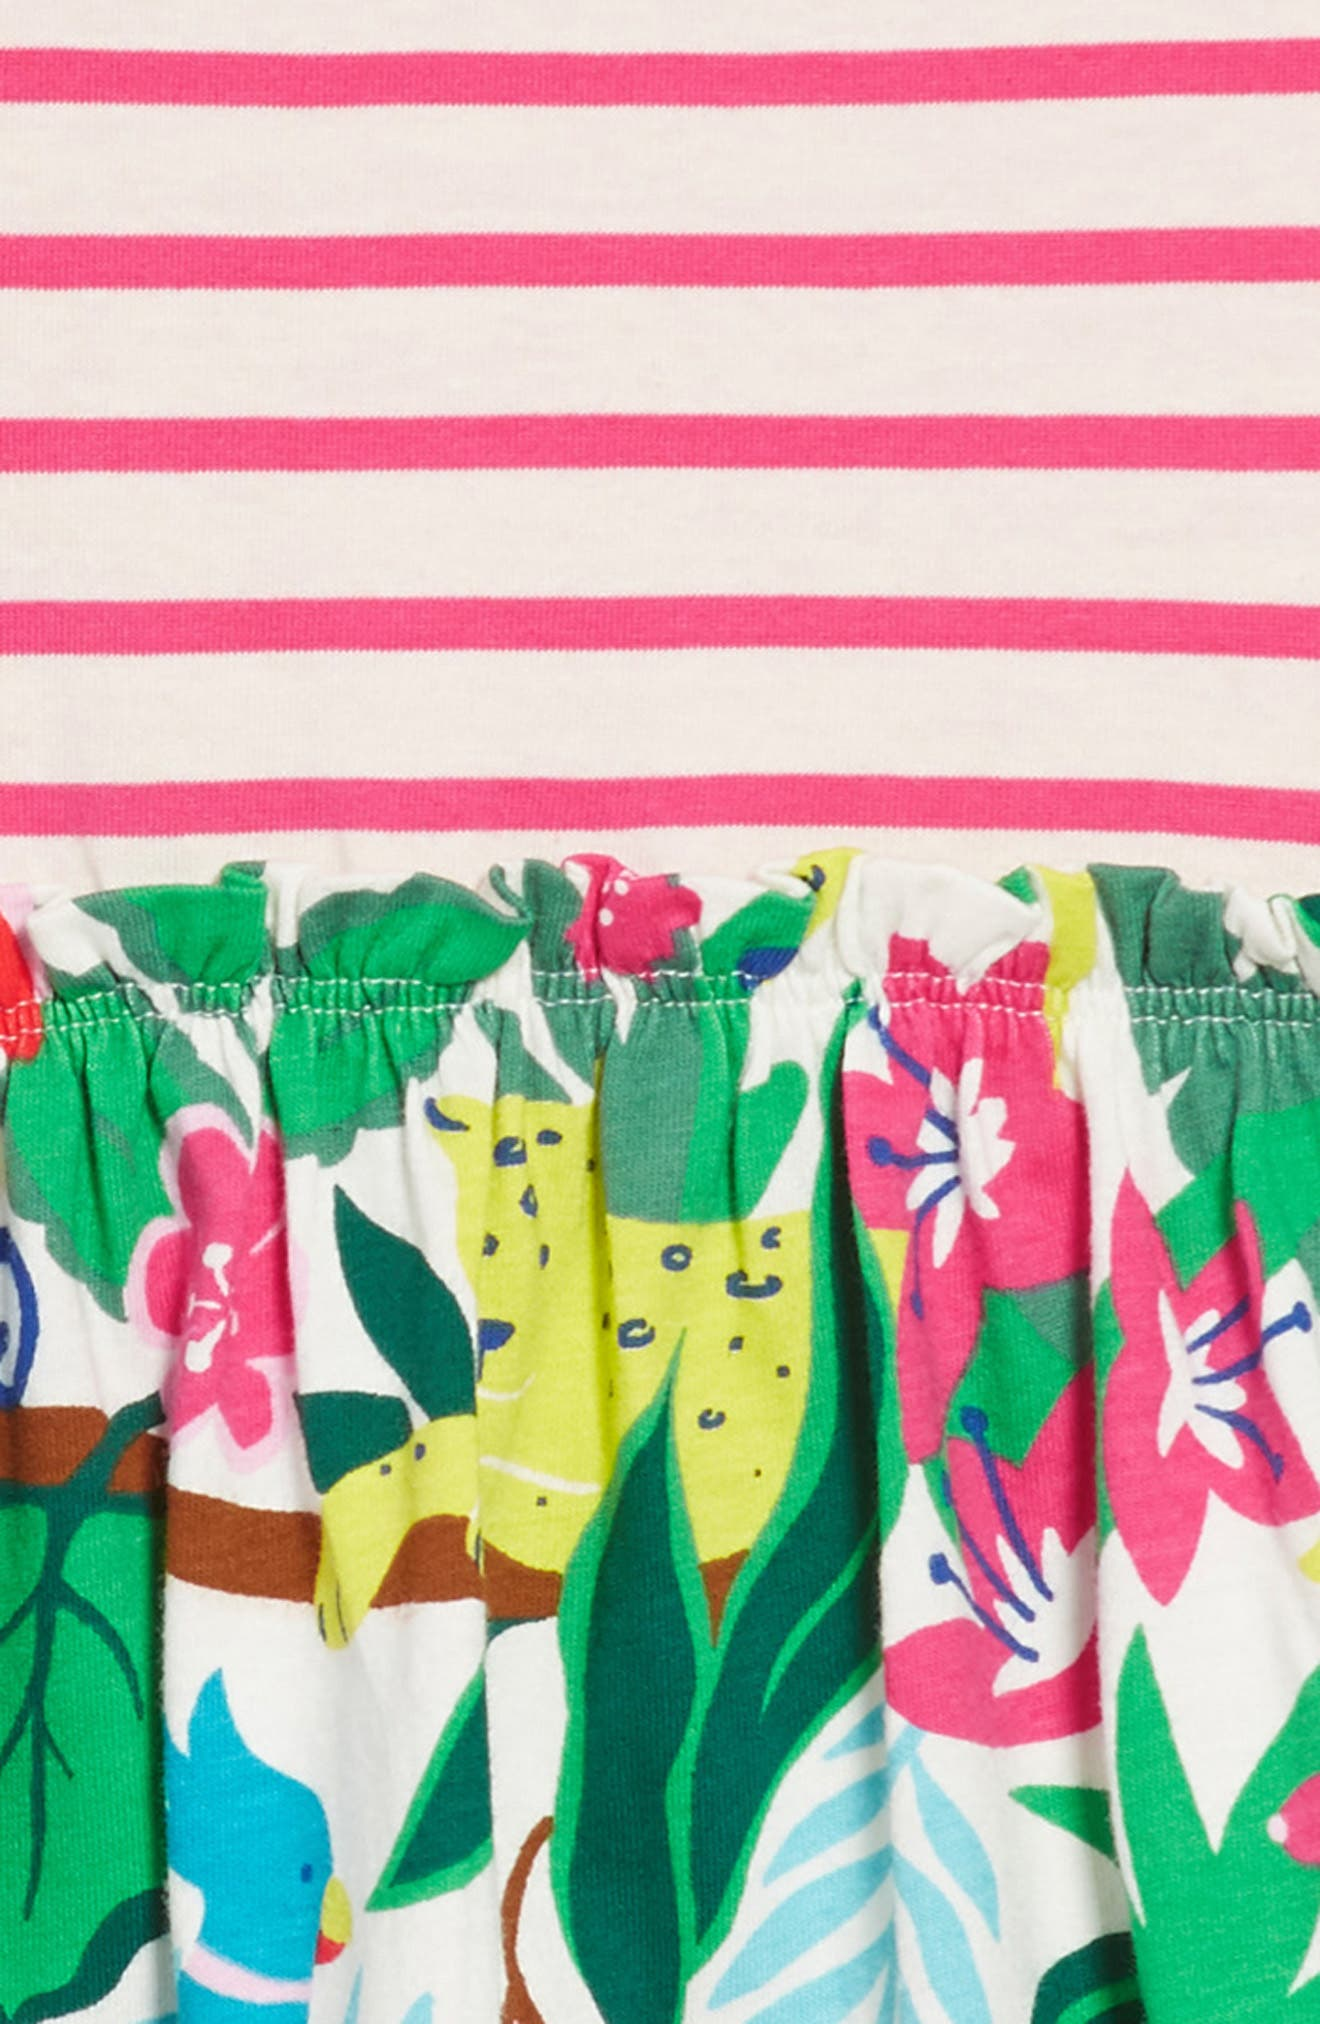 MINI BODEN,                             Bright Hotchpotch Jersey Dress,                             Alternate thumbnail 3, color,                             901